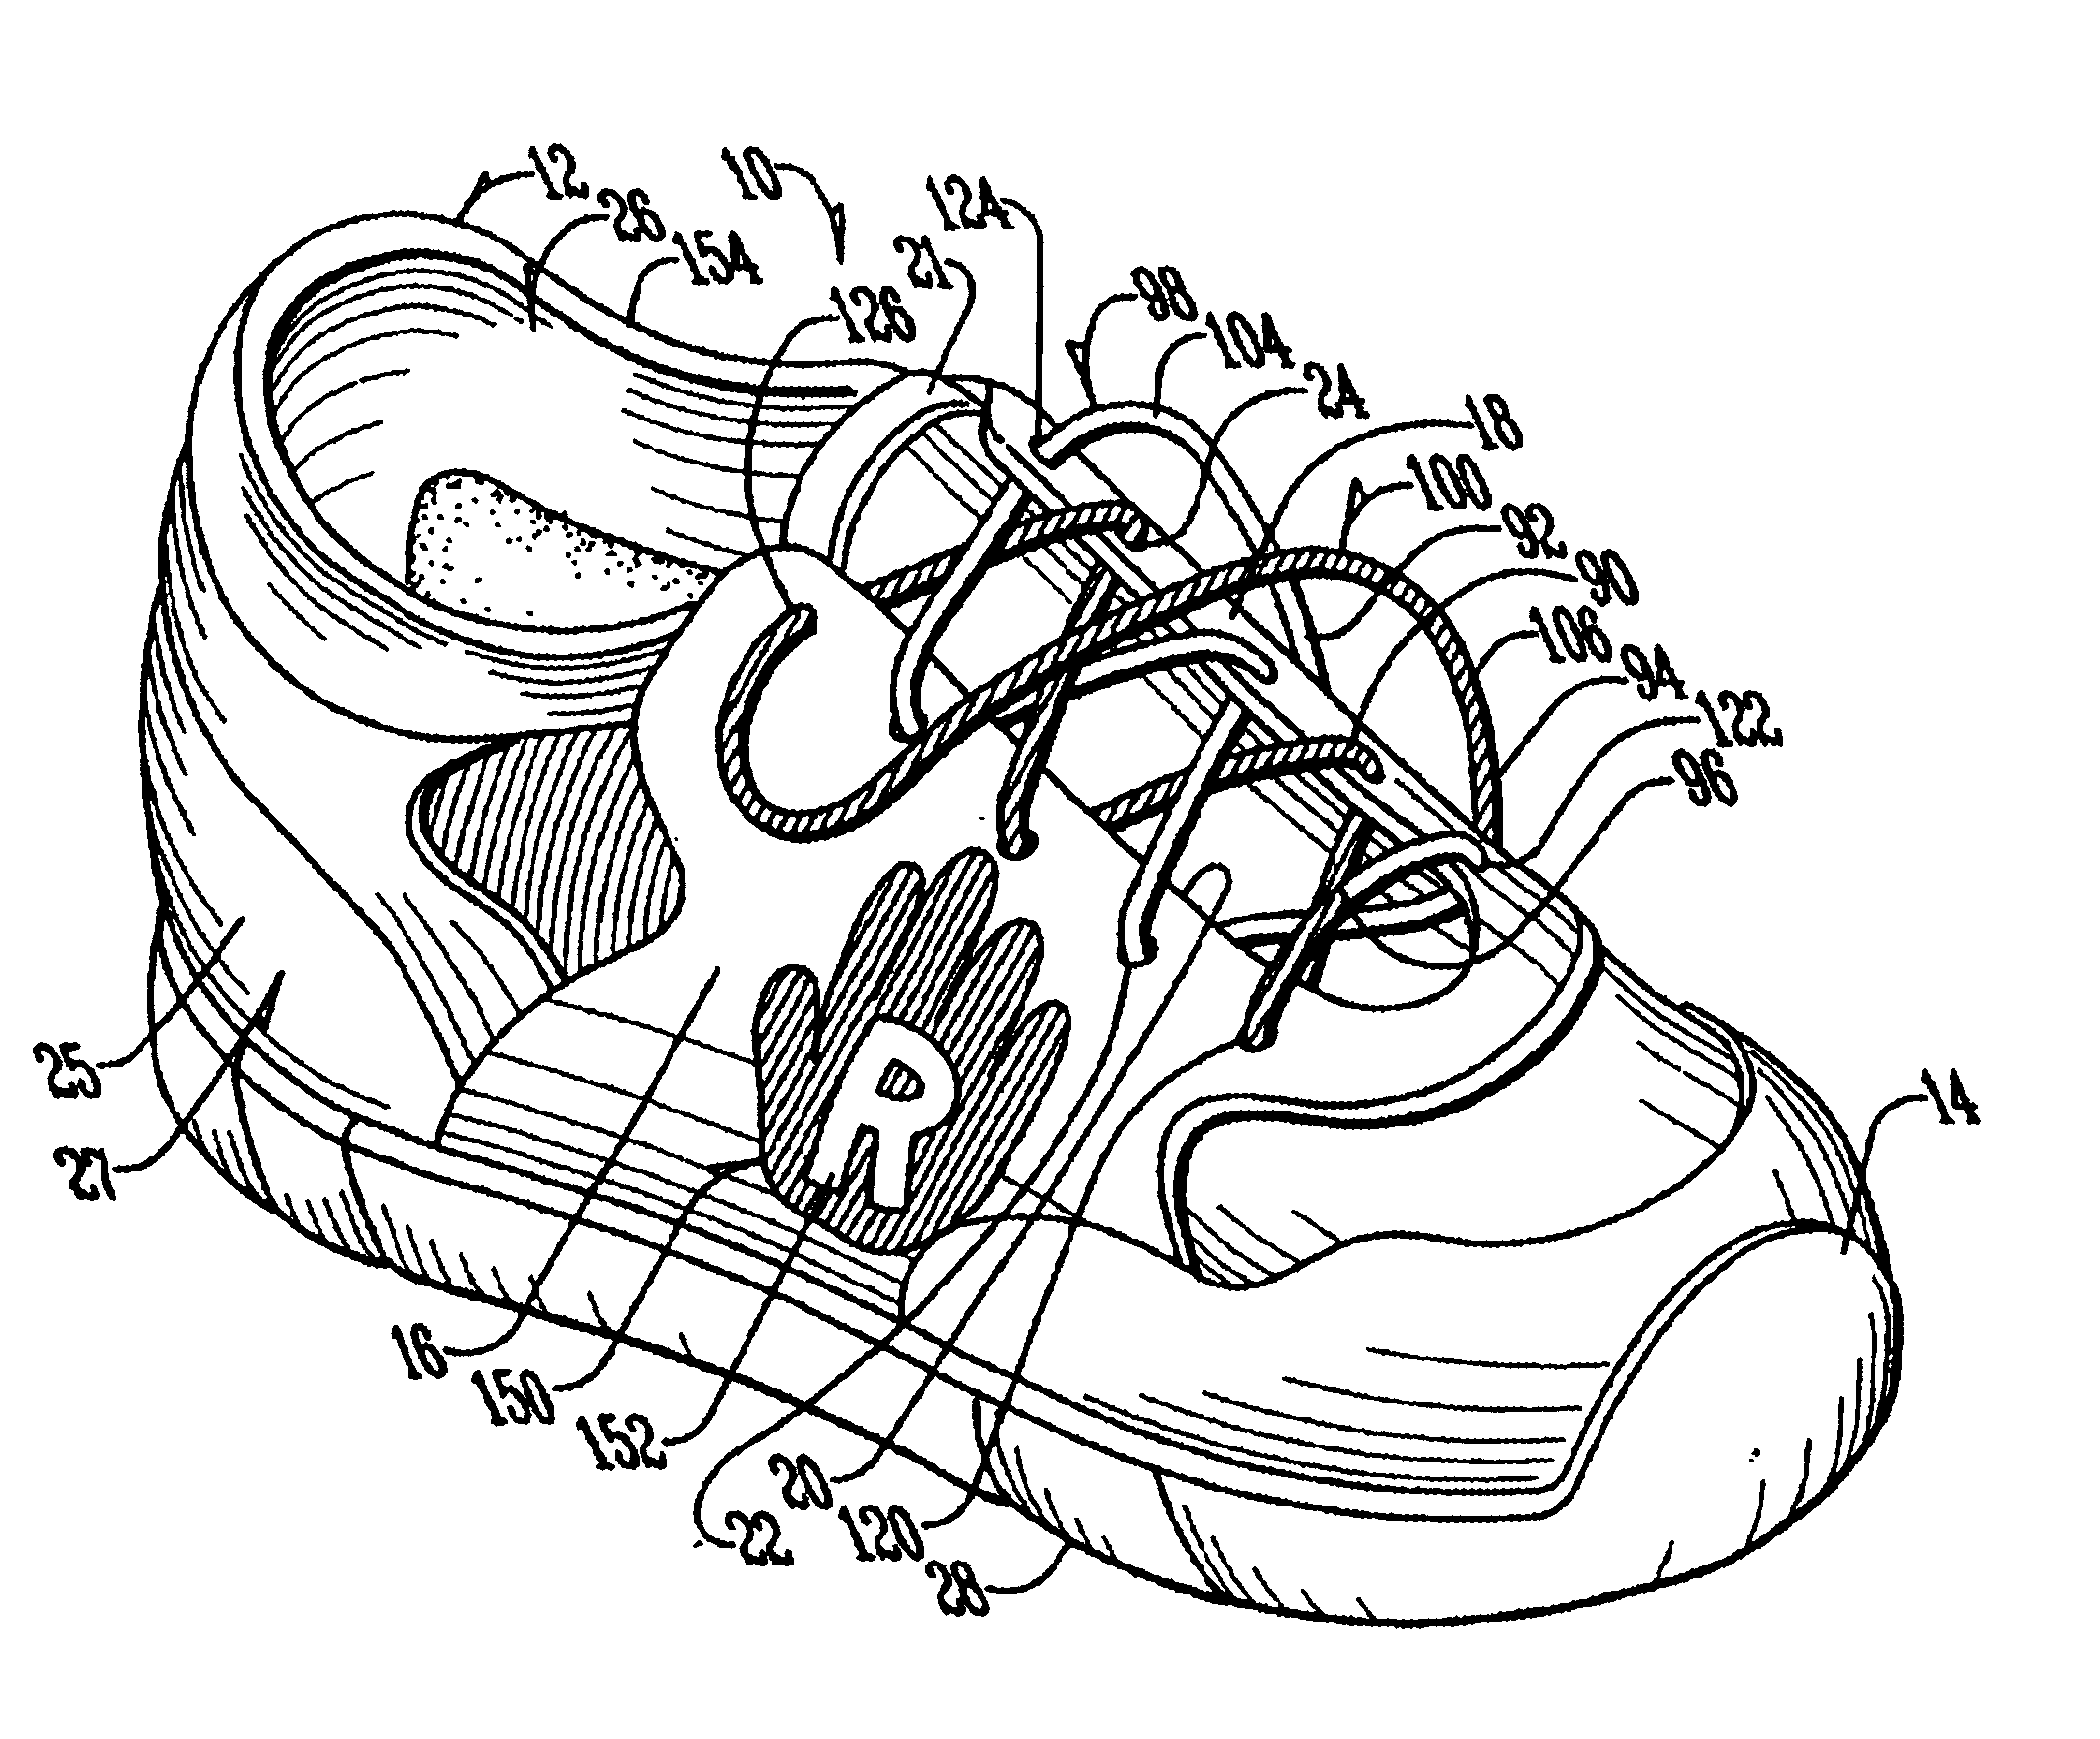 Tieshoes4